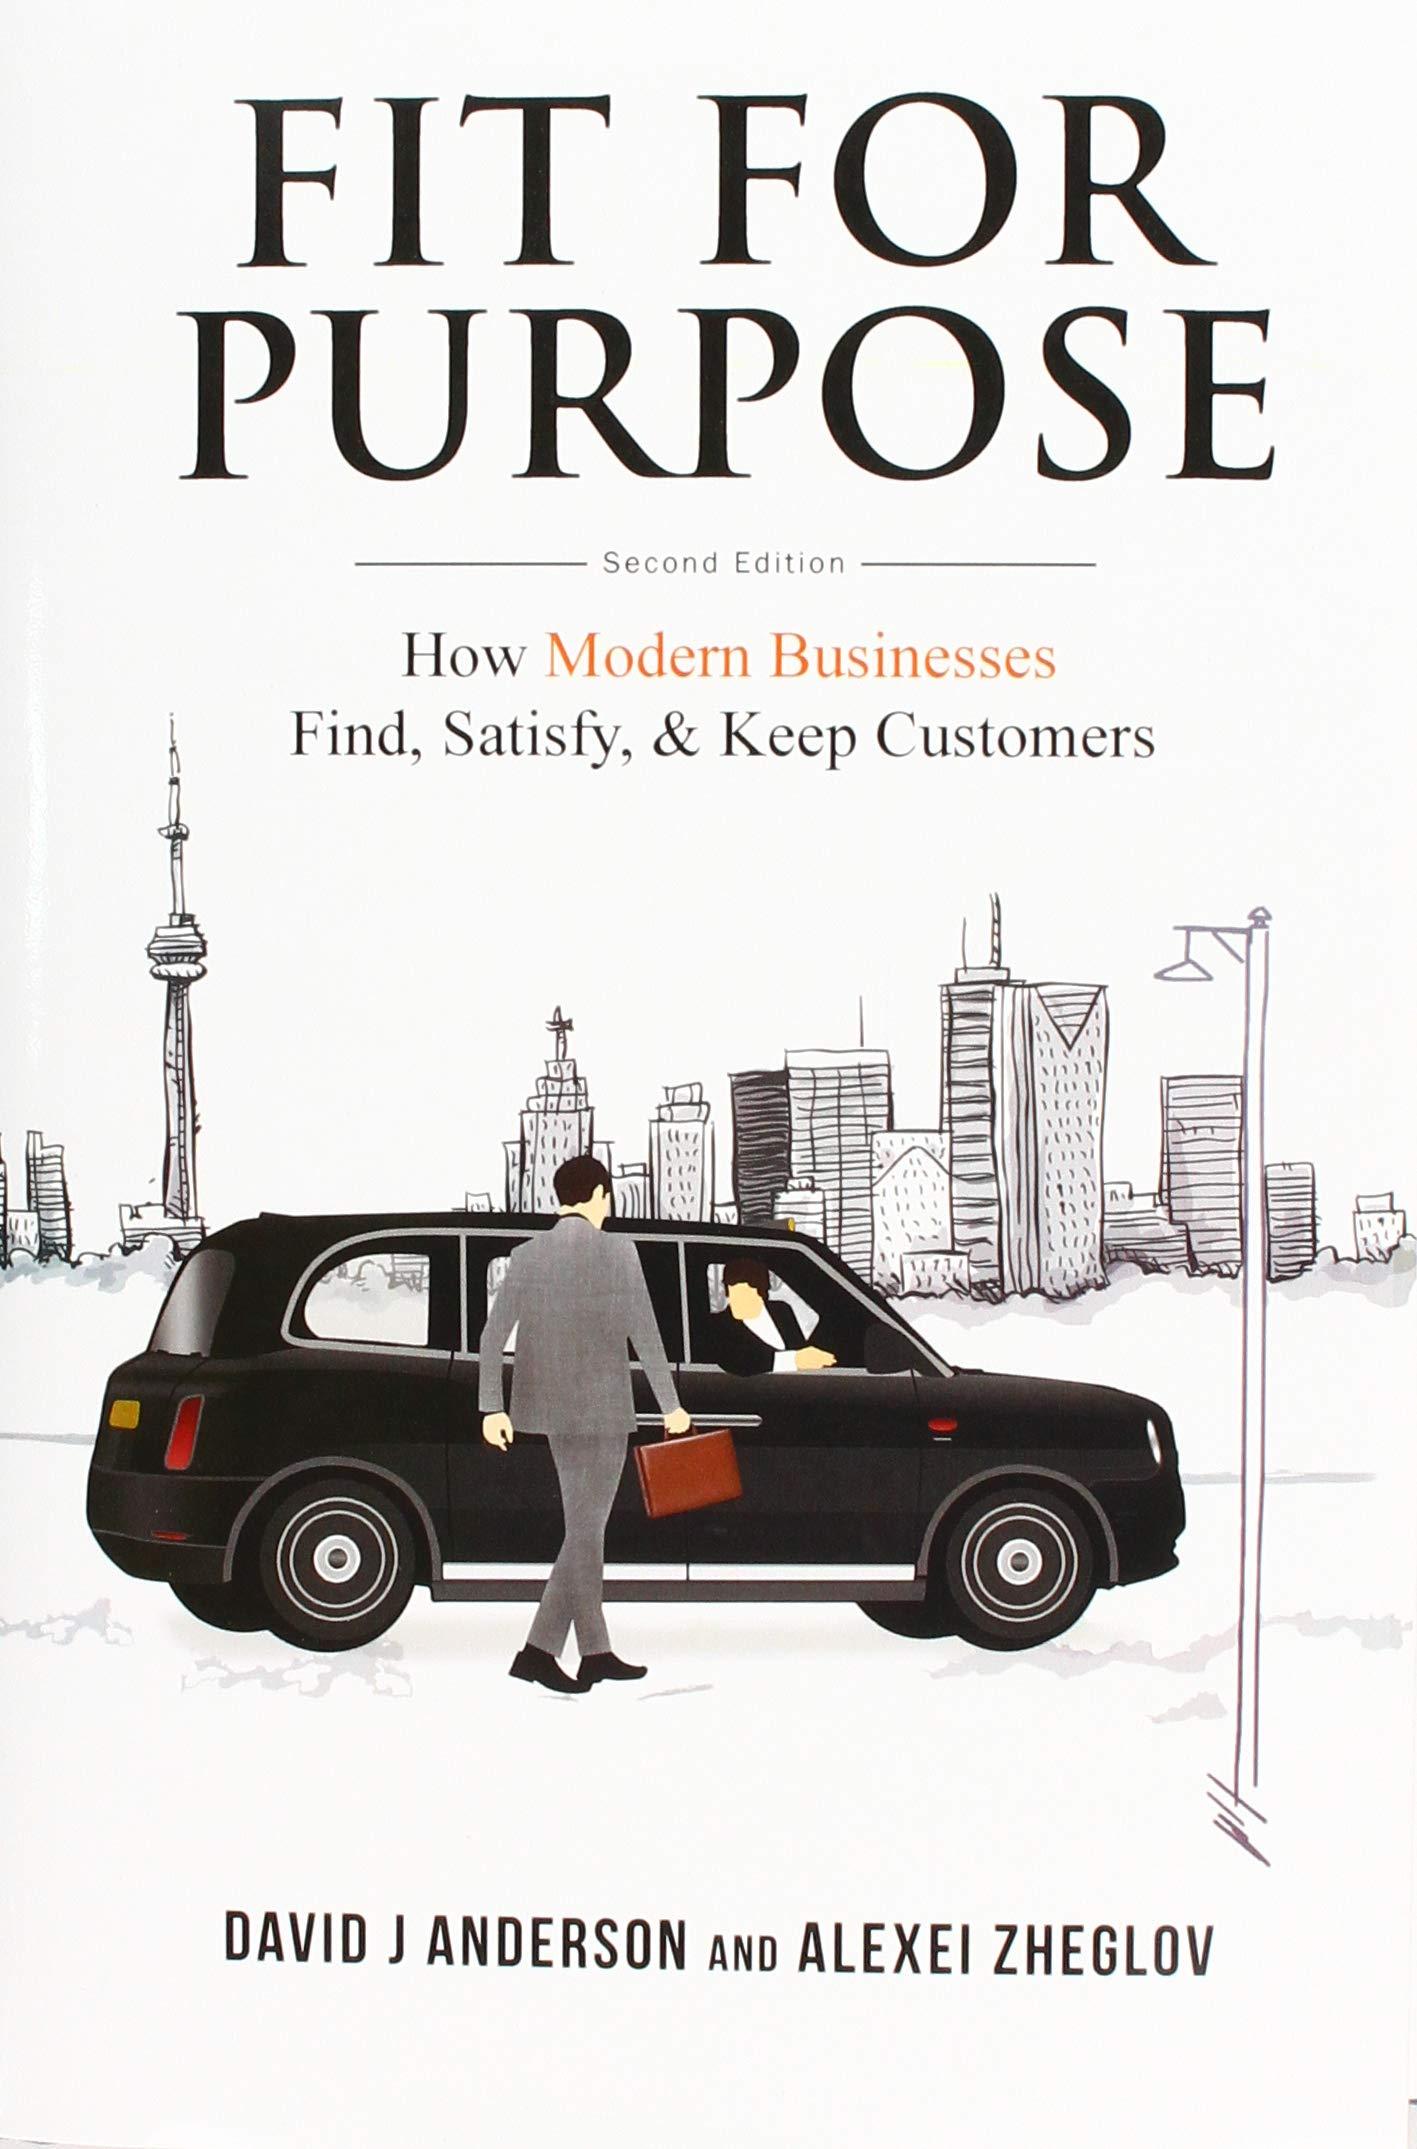 Fit for Purpose: How Modern Businesses Find, Satisfy, & Keep Customers (Inglese) Copertina rigida – 20 set 2018 David J. Anderson Alexei Zheglov BLUE HOLE PR 1732821208